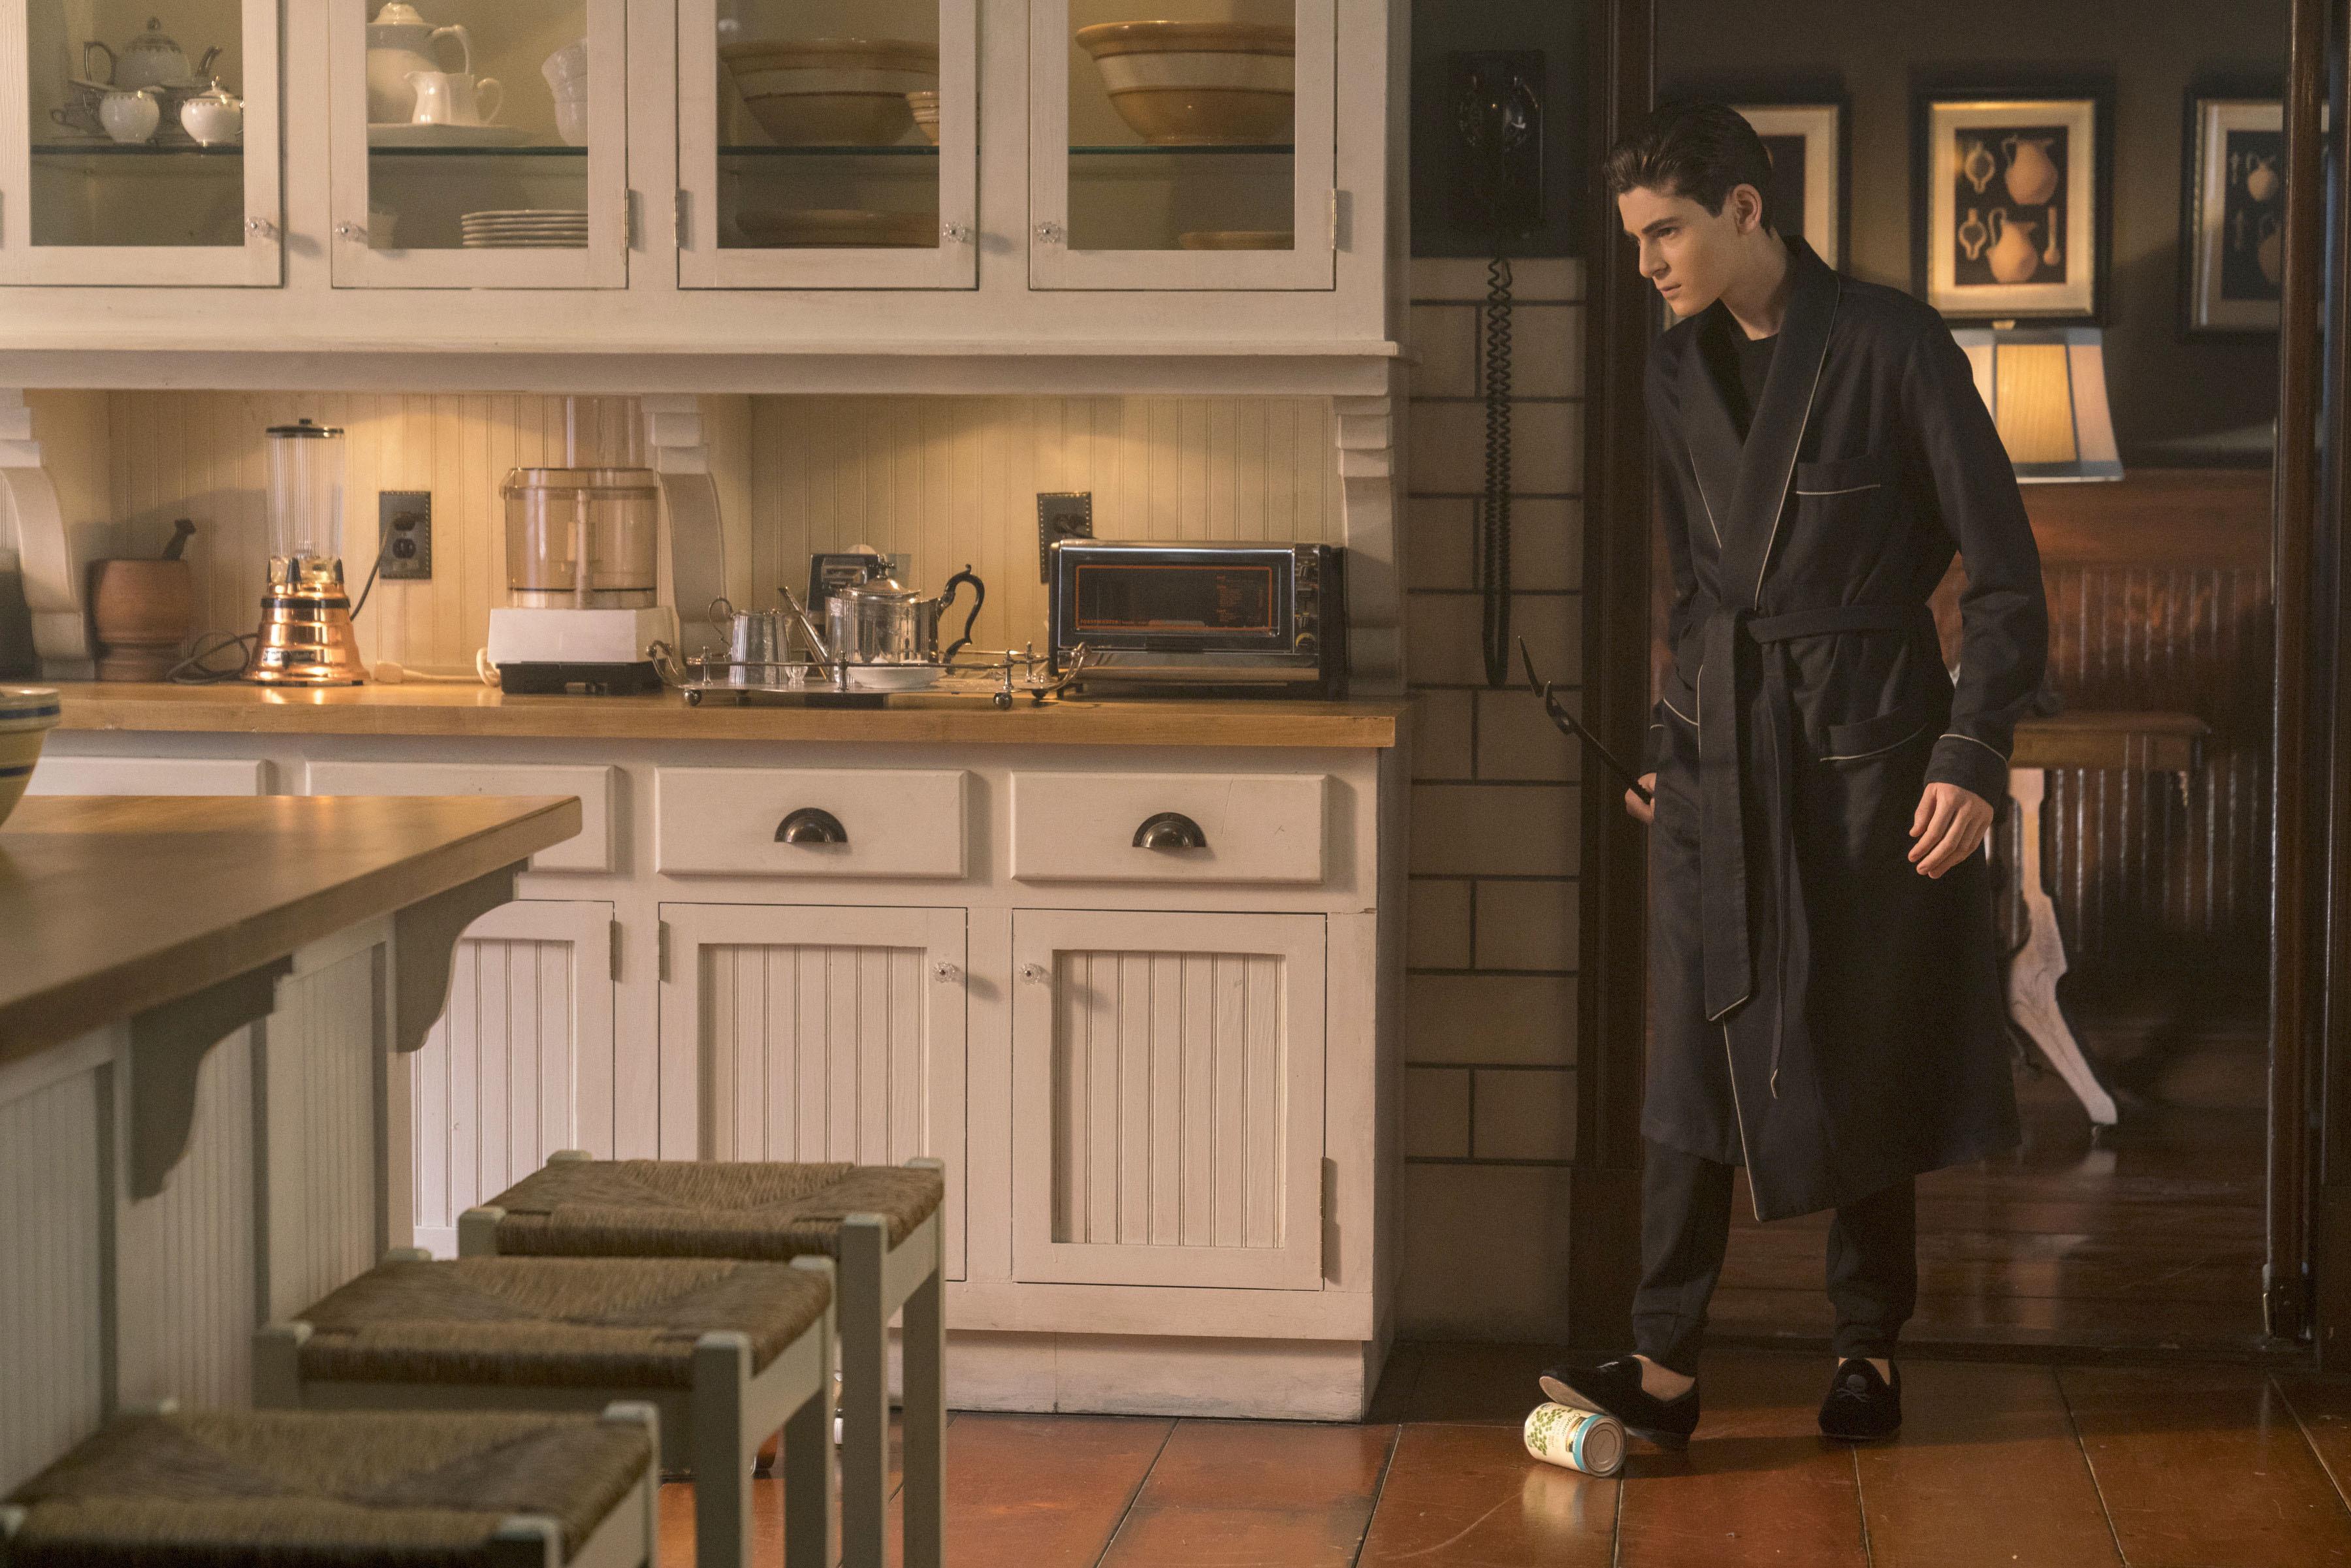 Index Of Gotham Season 4 Episode 15